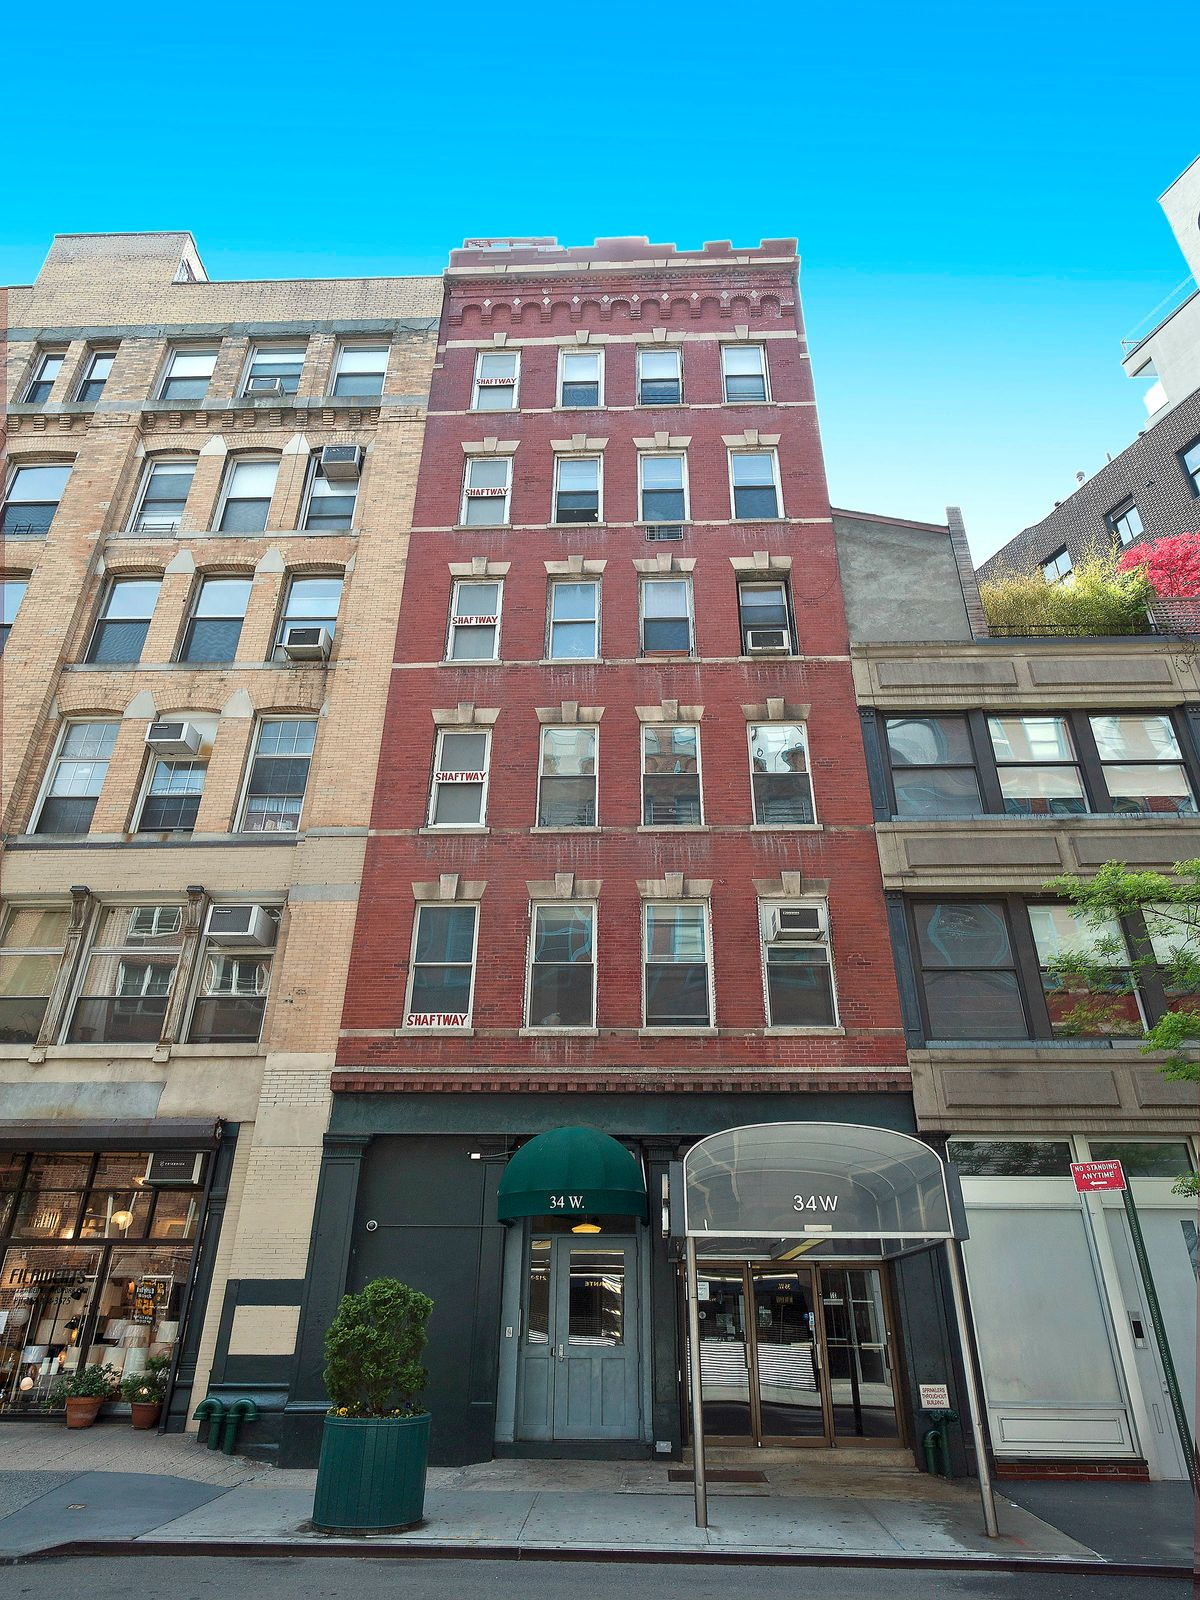 34 West 13th Street, Apt 3N